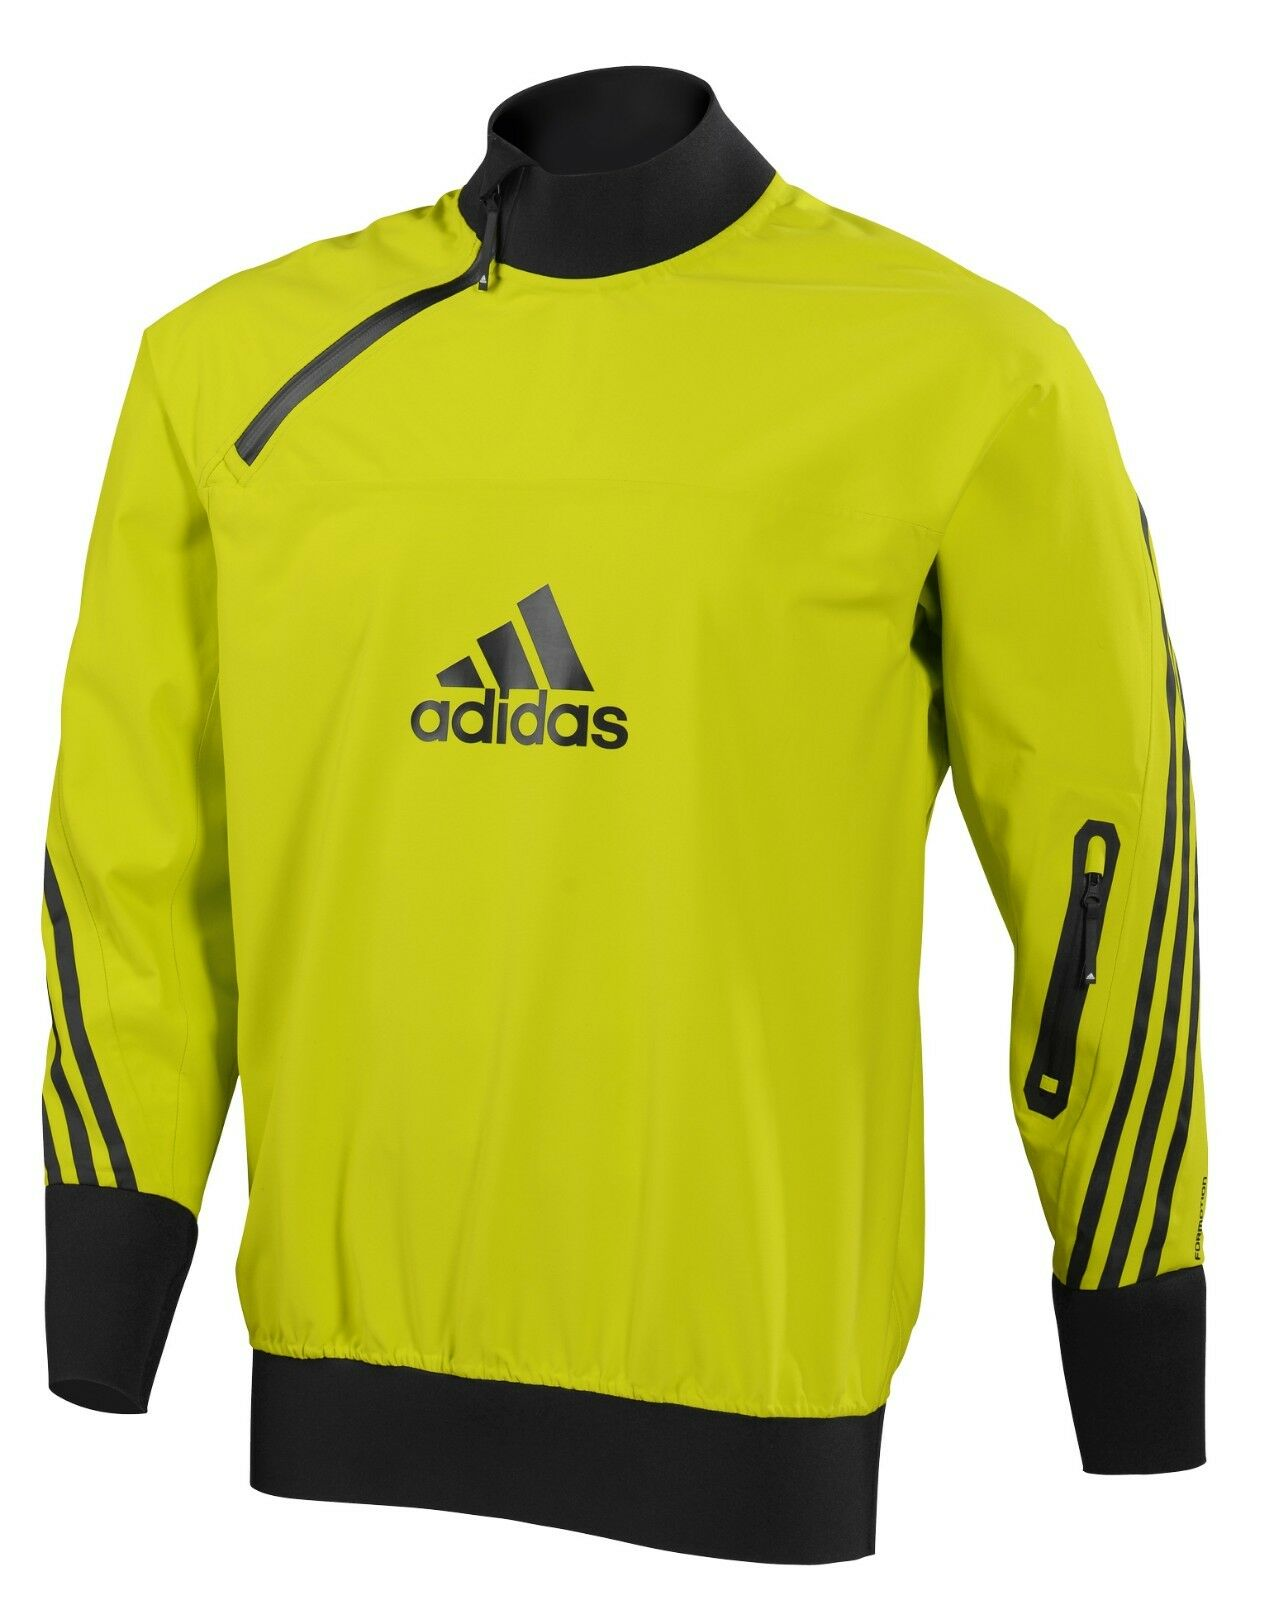 Adidas Sailing - Spray Top Jacket